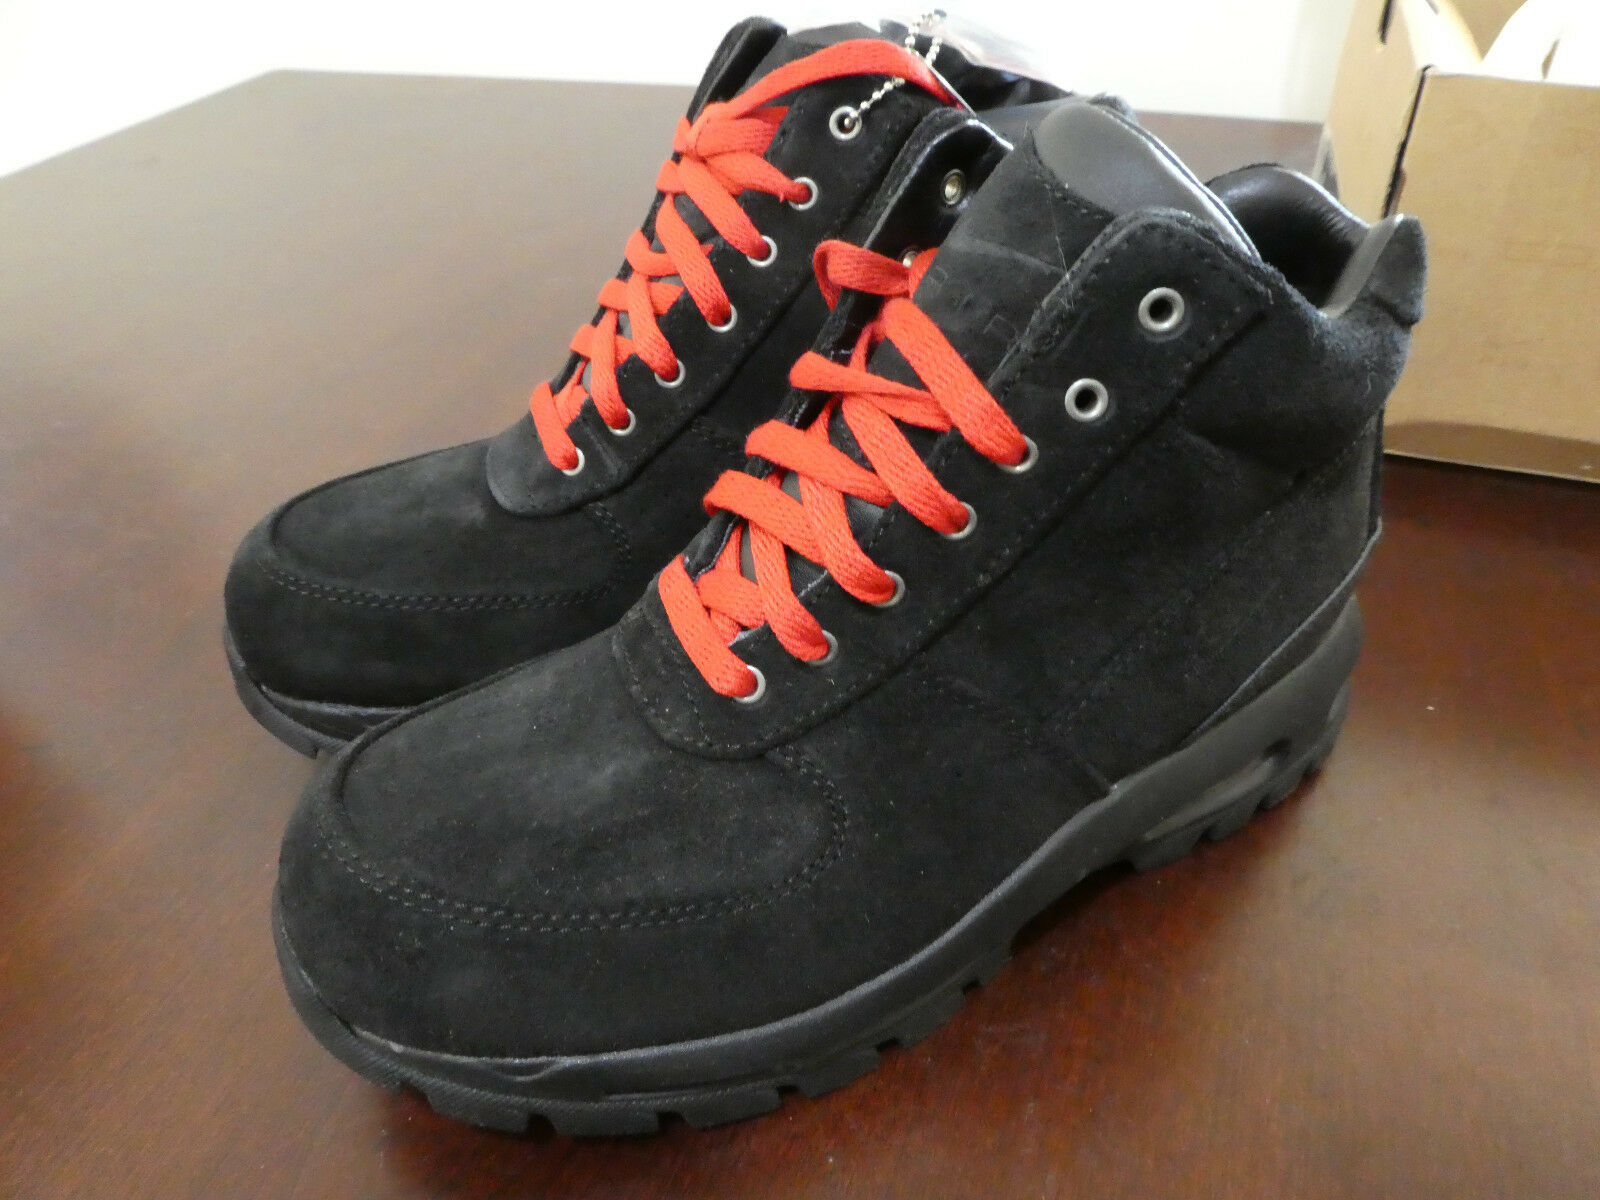 Nike Air Max Goadome mens boots brown 865031 016 new suede black